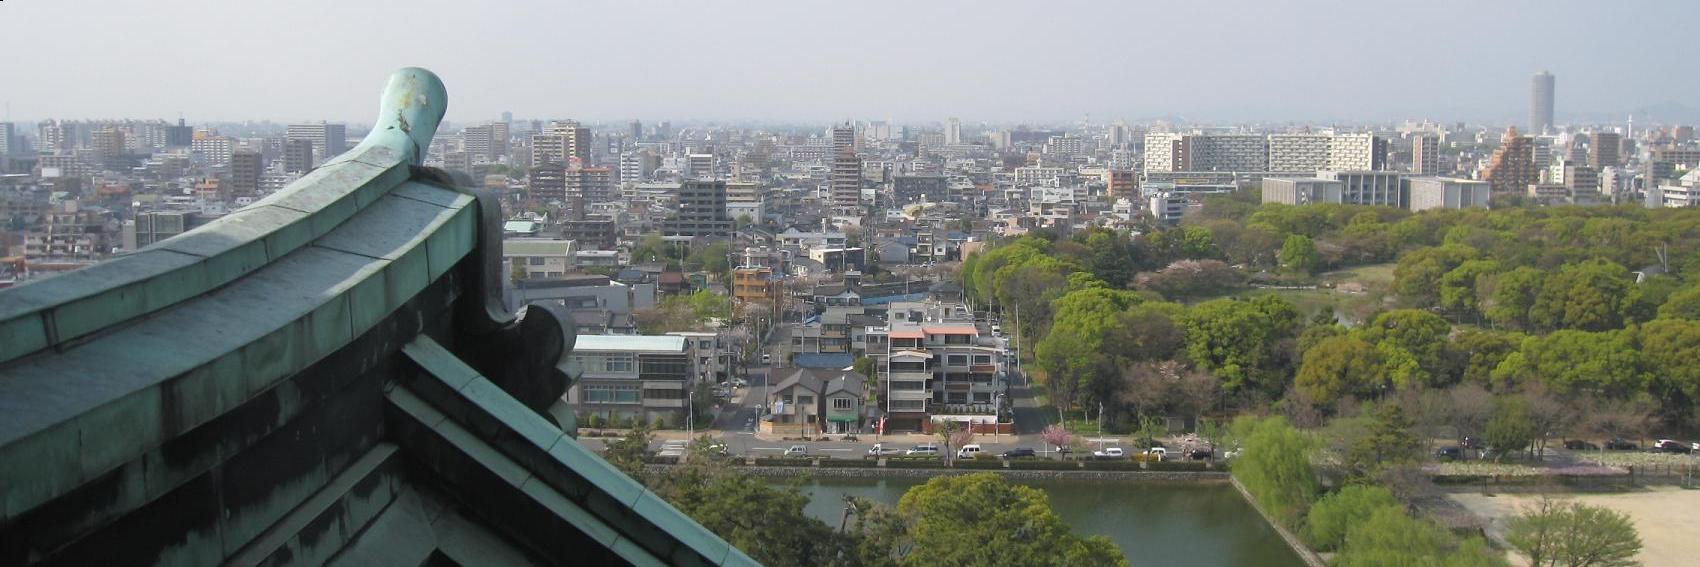 Nagoyabanner3.jpg